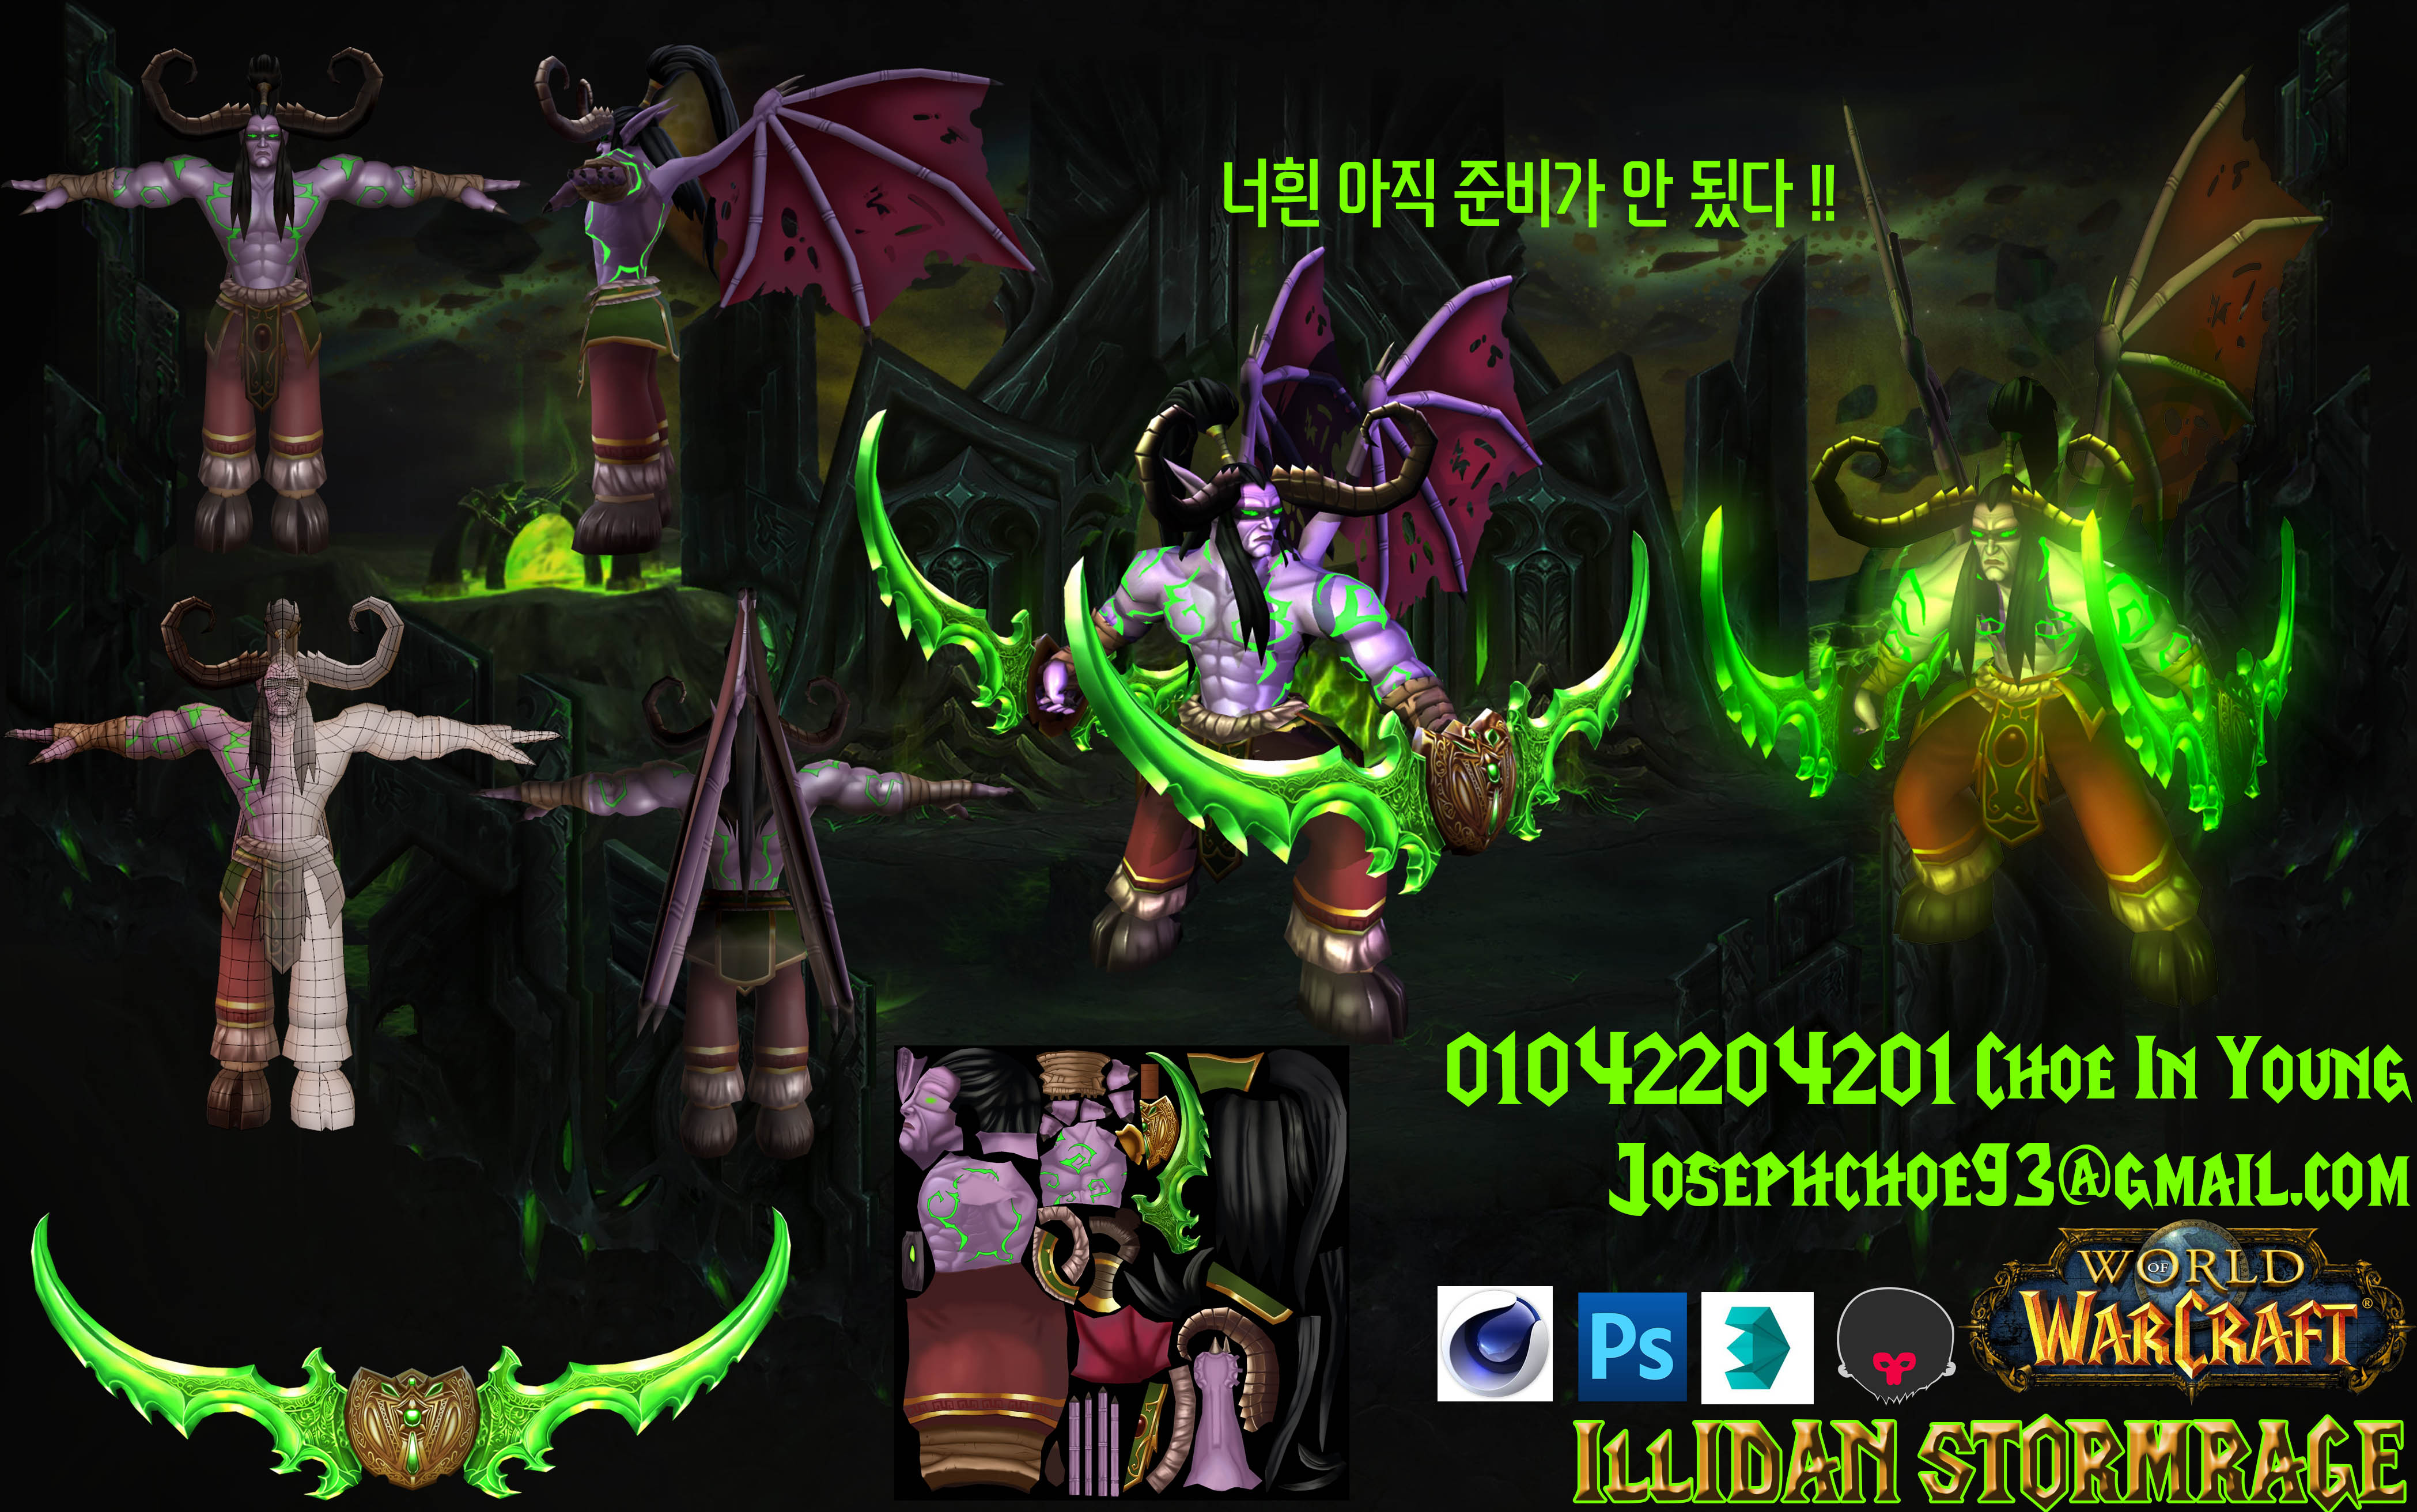 World of WarCraft illidan